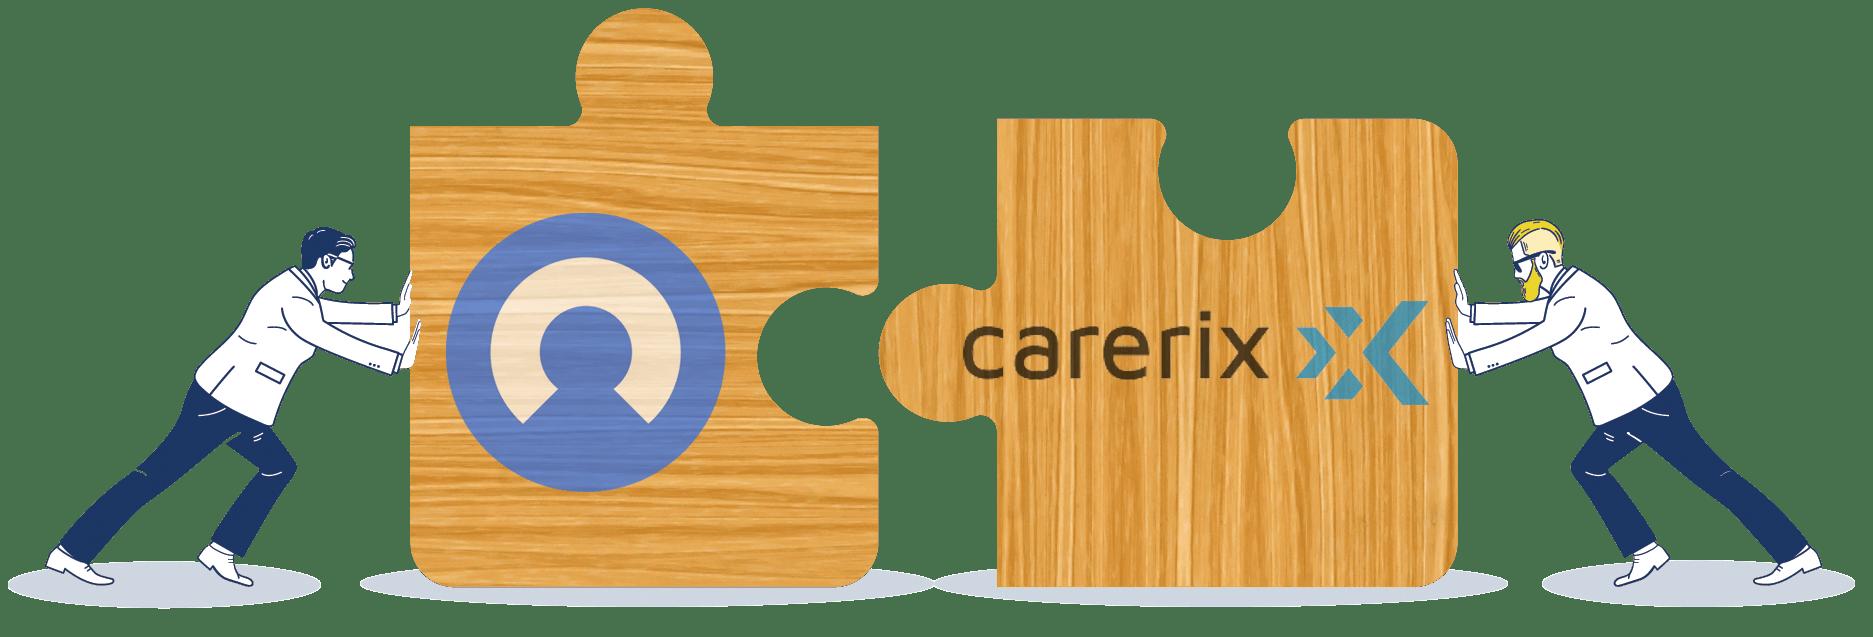 Carerix + slimme telefonie